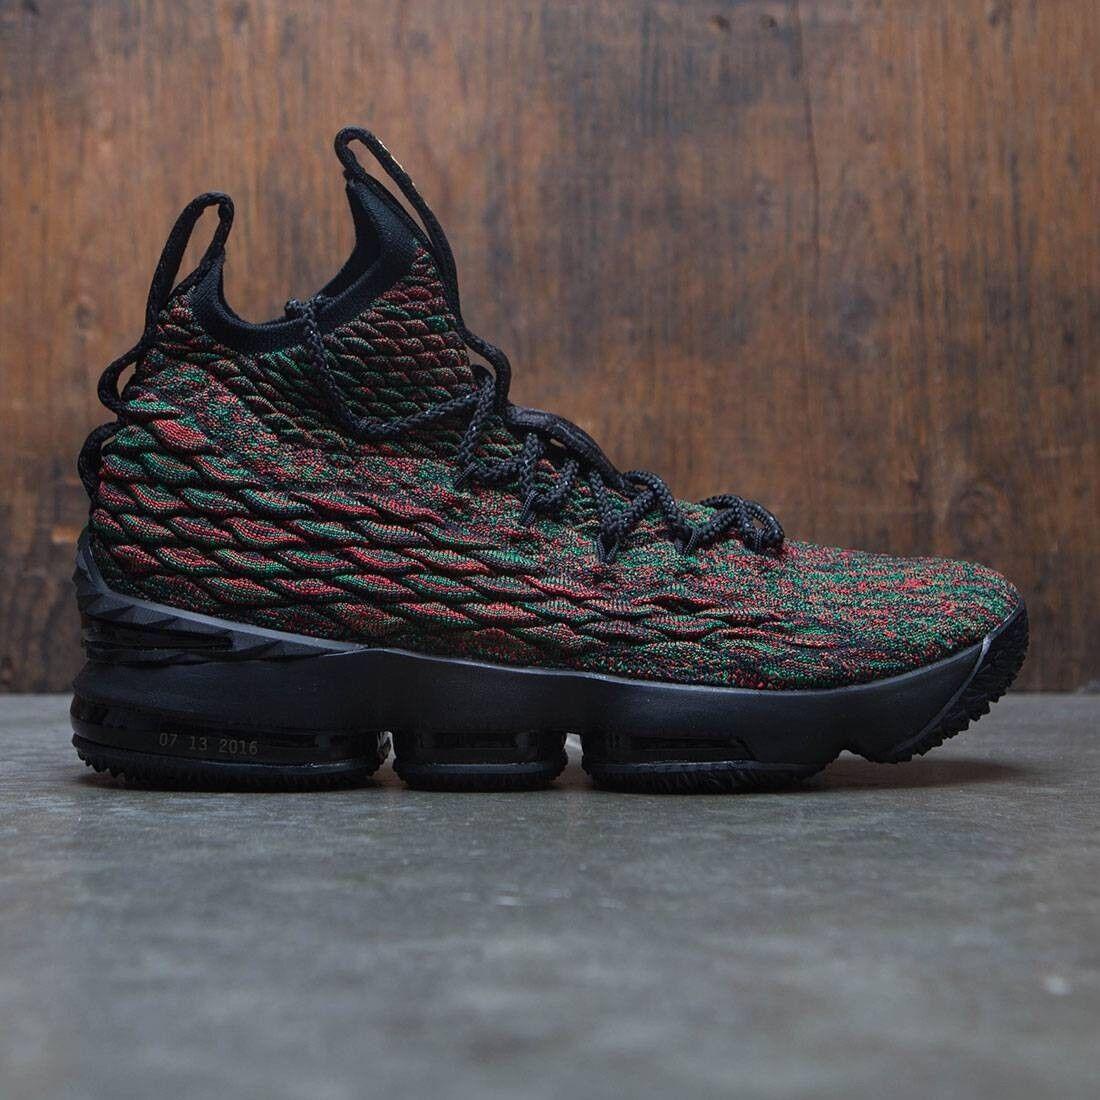 Nike LeBron 15 XV BHM LMTD Comfortable Cheap women's shoes women's shoes